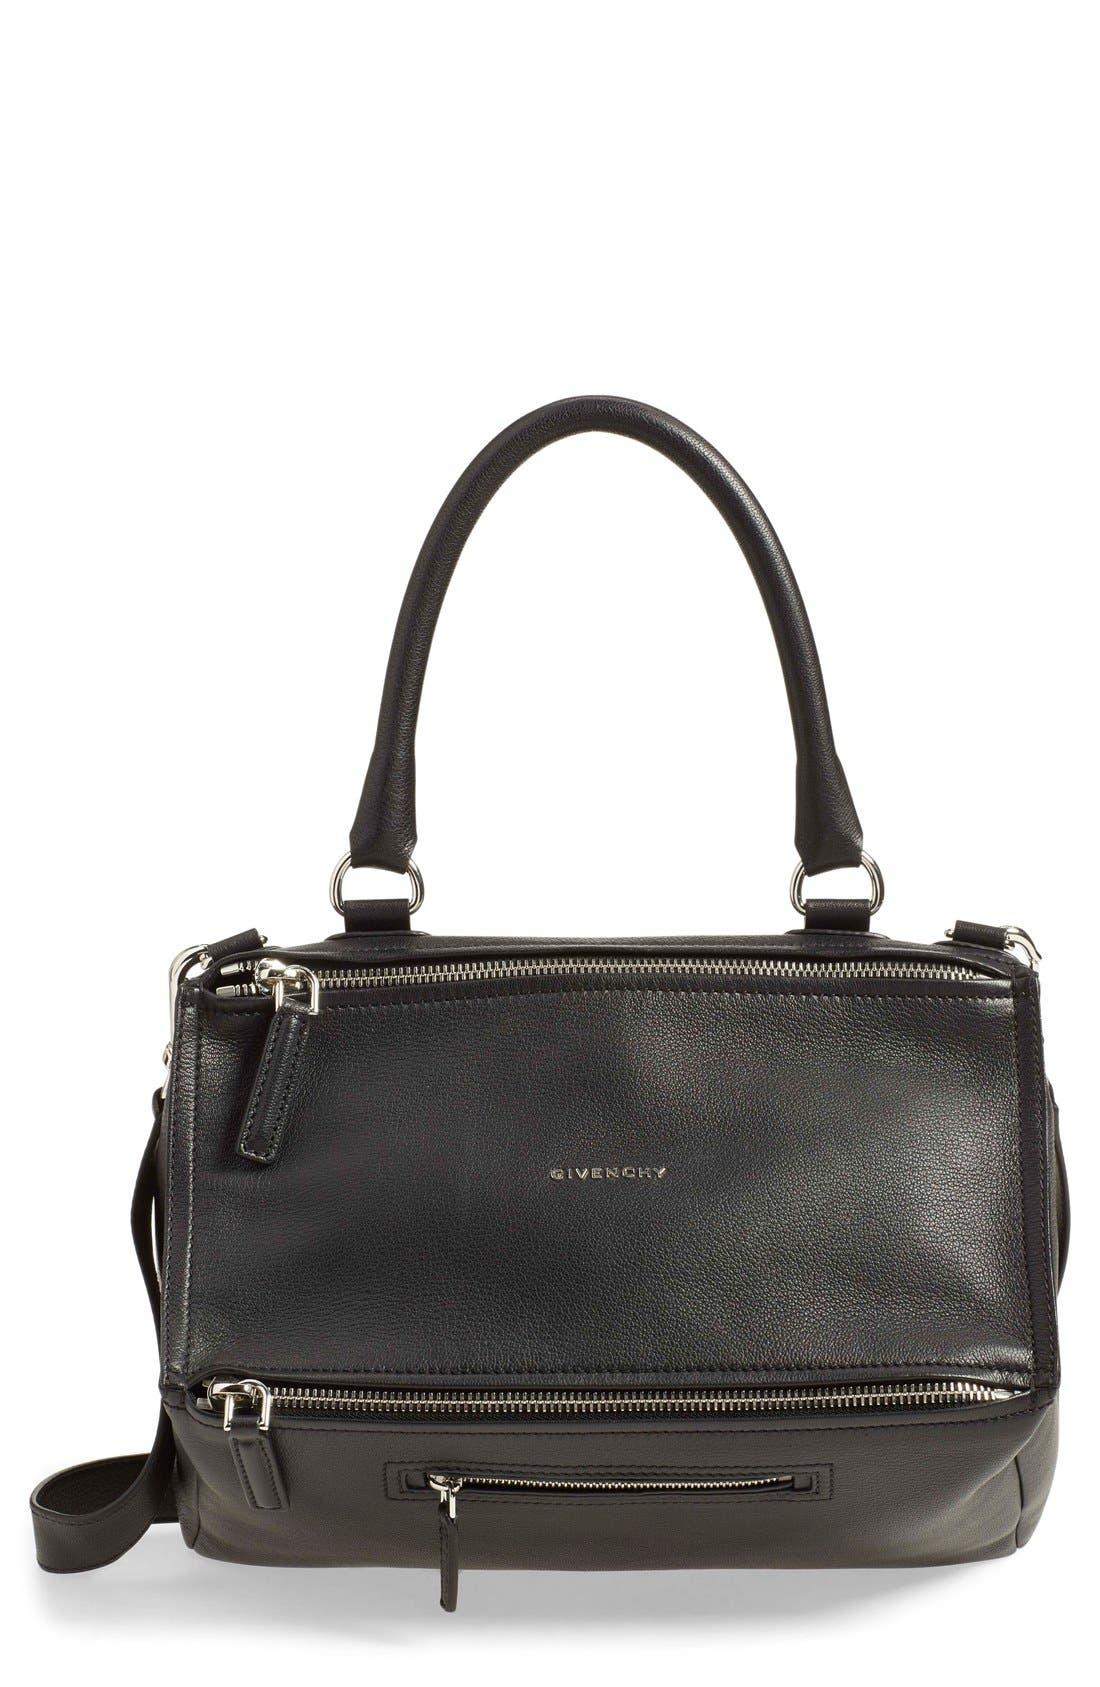 'Medium Pandora' Sugar Leather Satchel,                             Main thumbnail 1, color,                             Black